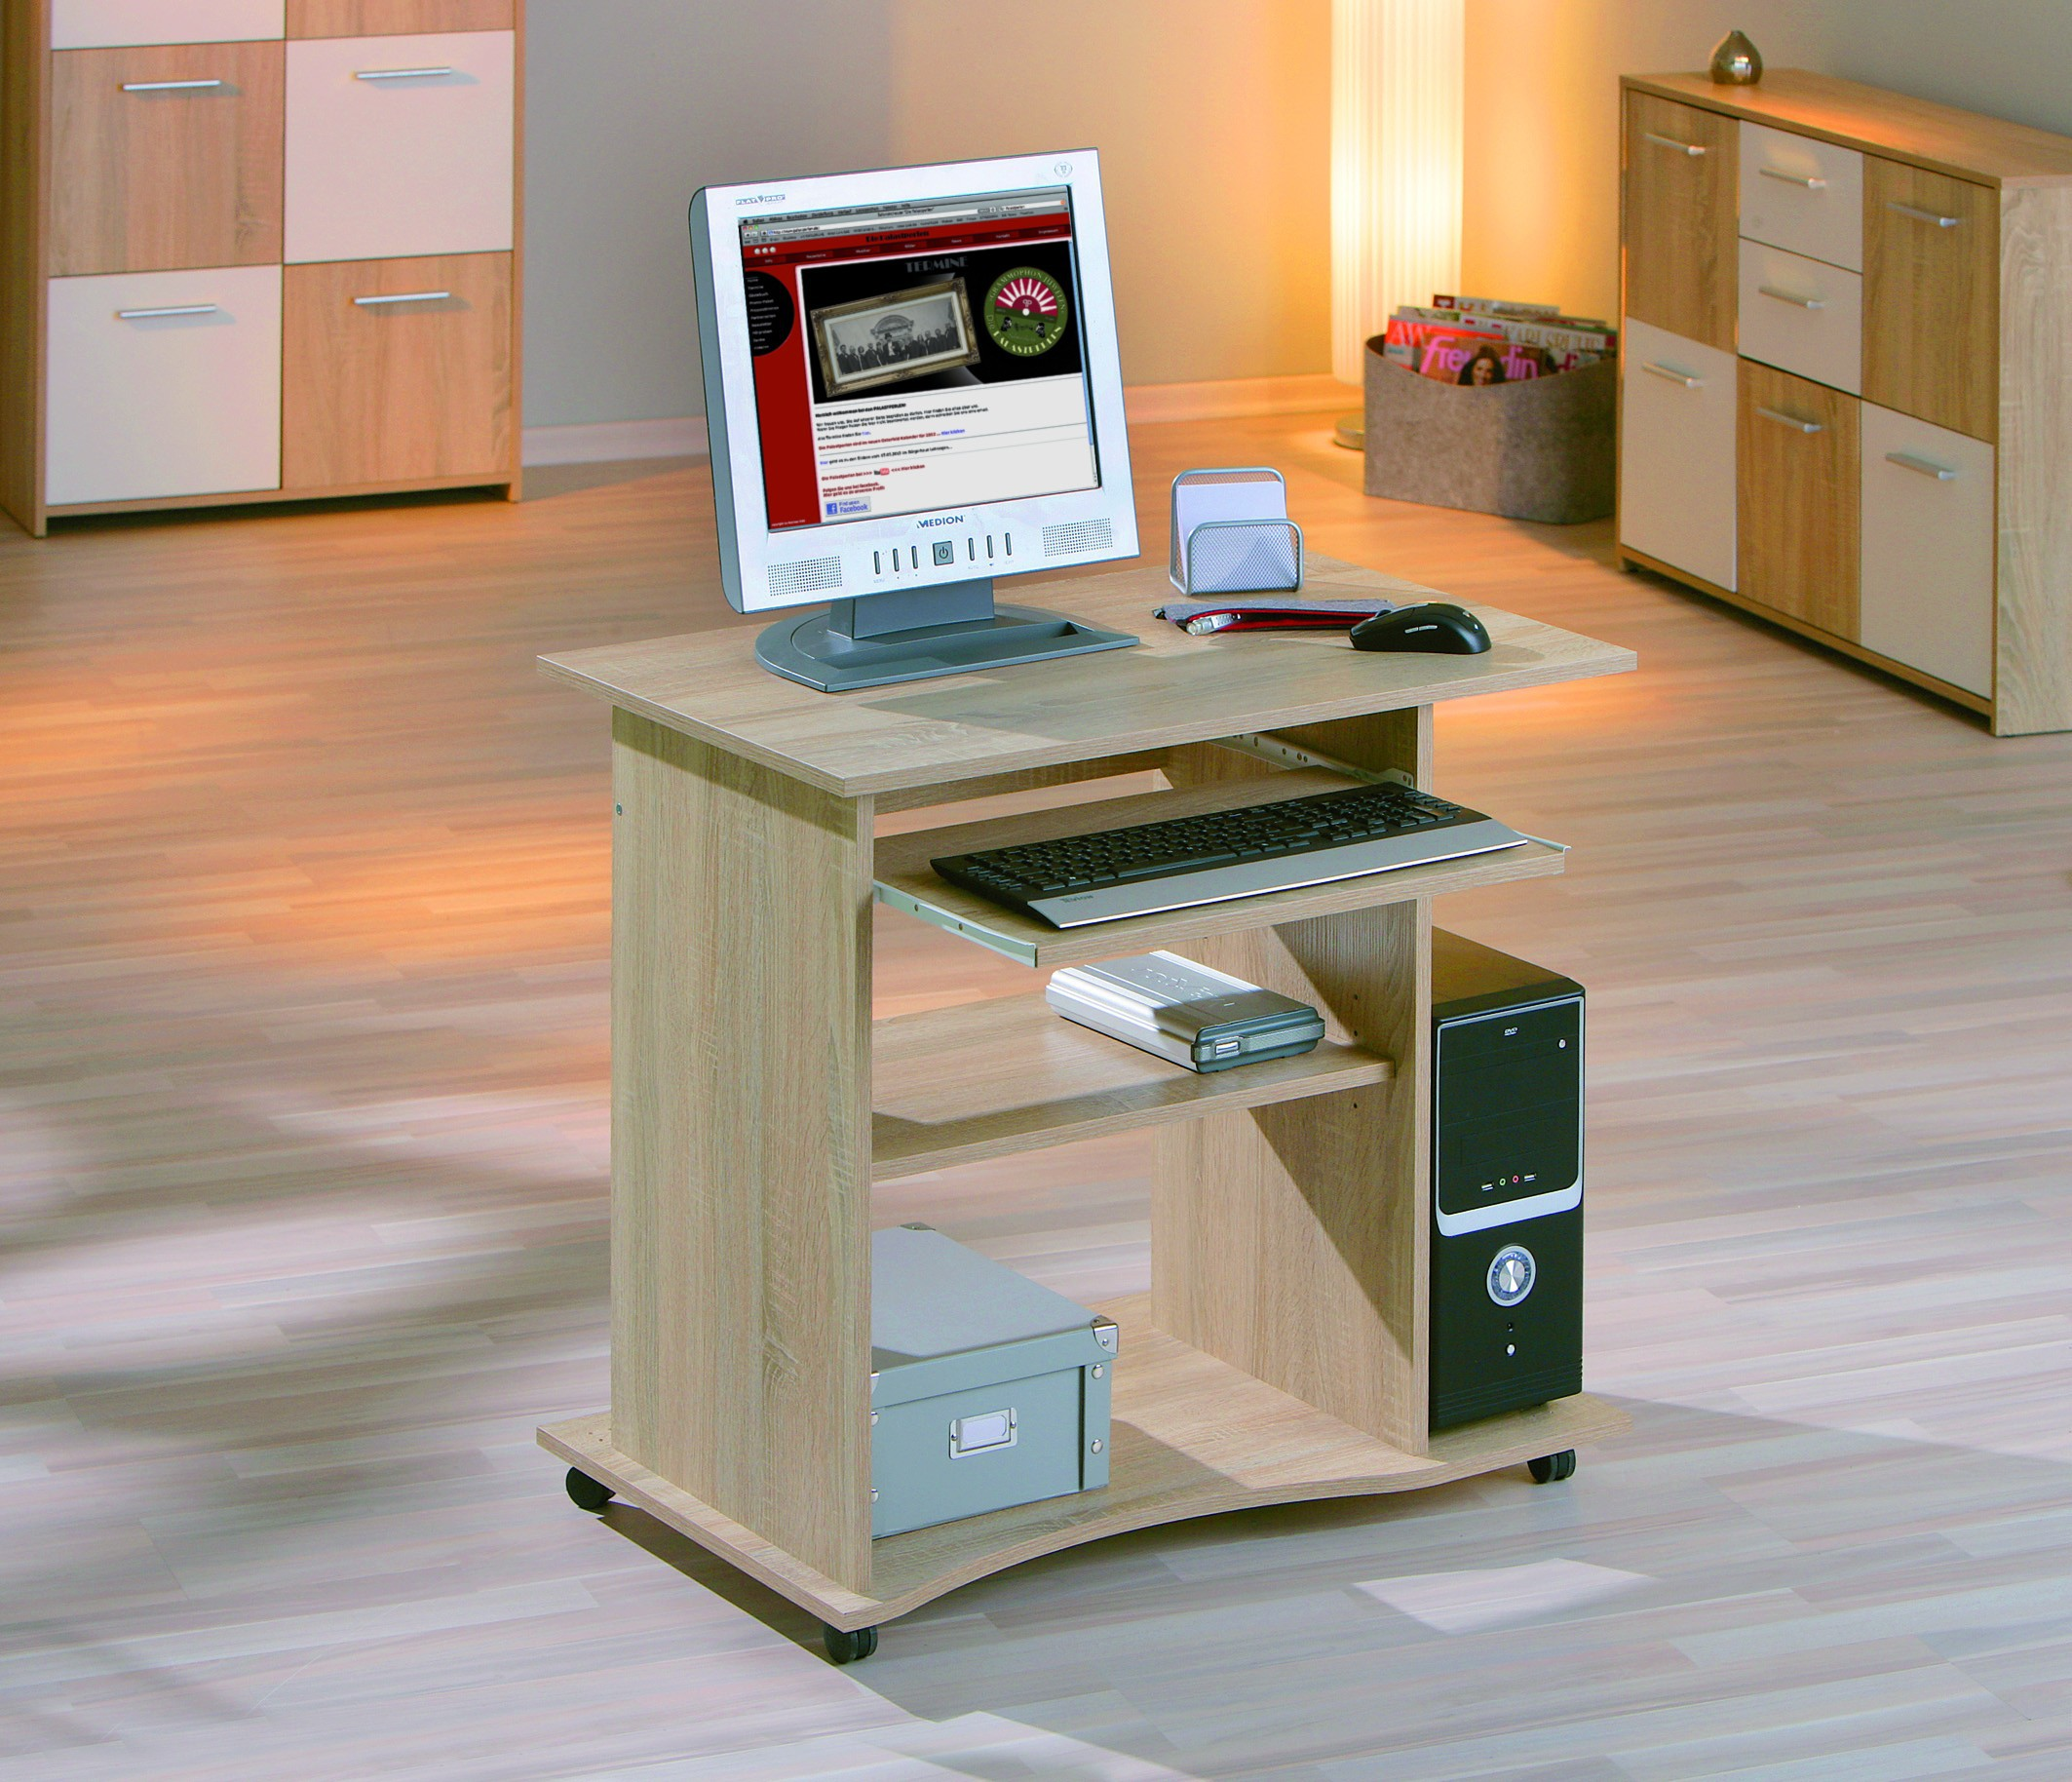 Bureau mobile durini 80x50 sonoma chene for Meuble 80x50